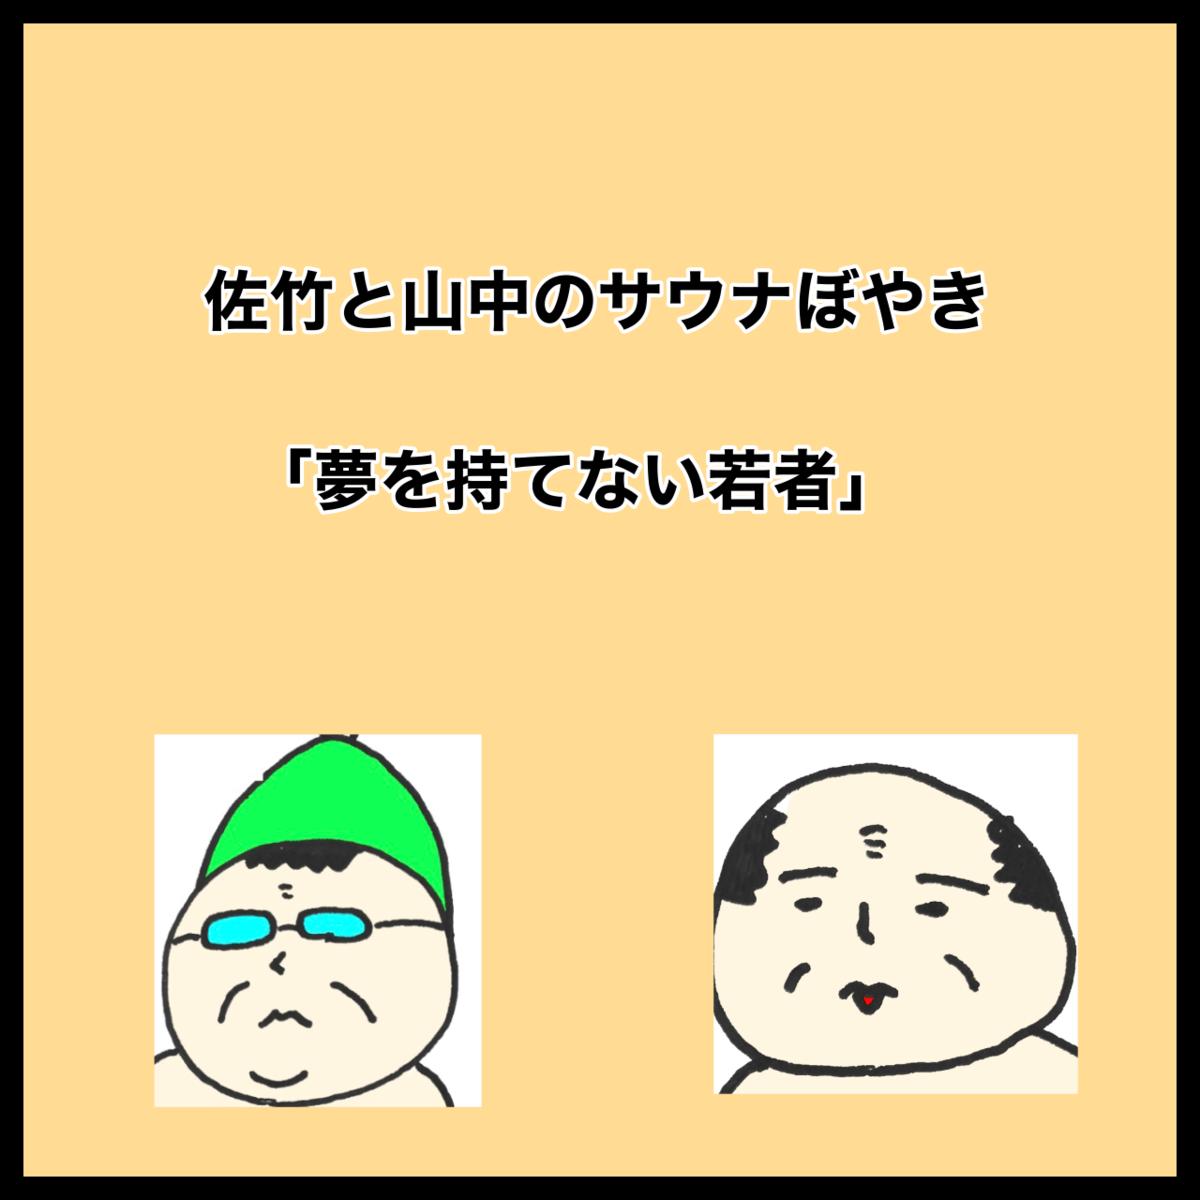 f:id:kinoko1629:20211005230421p:plain